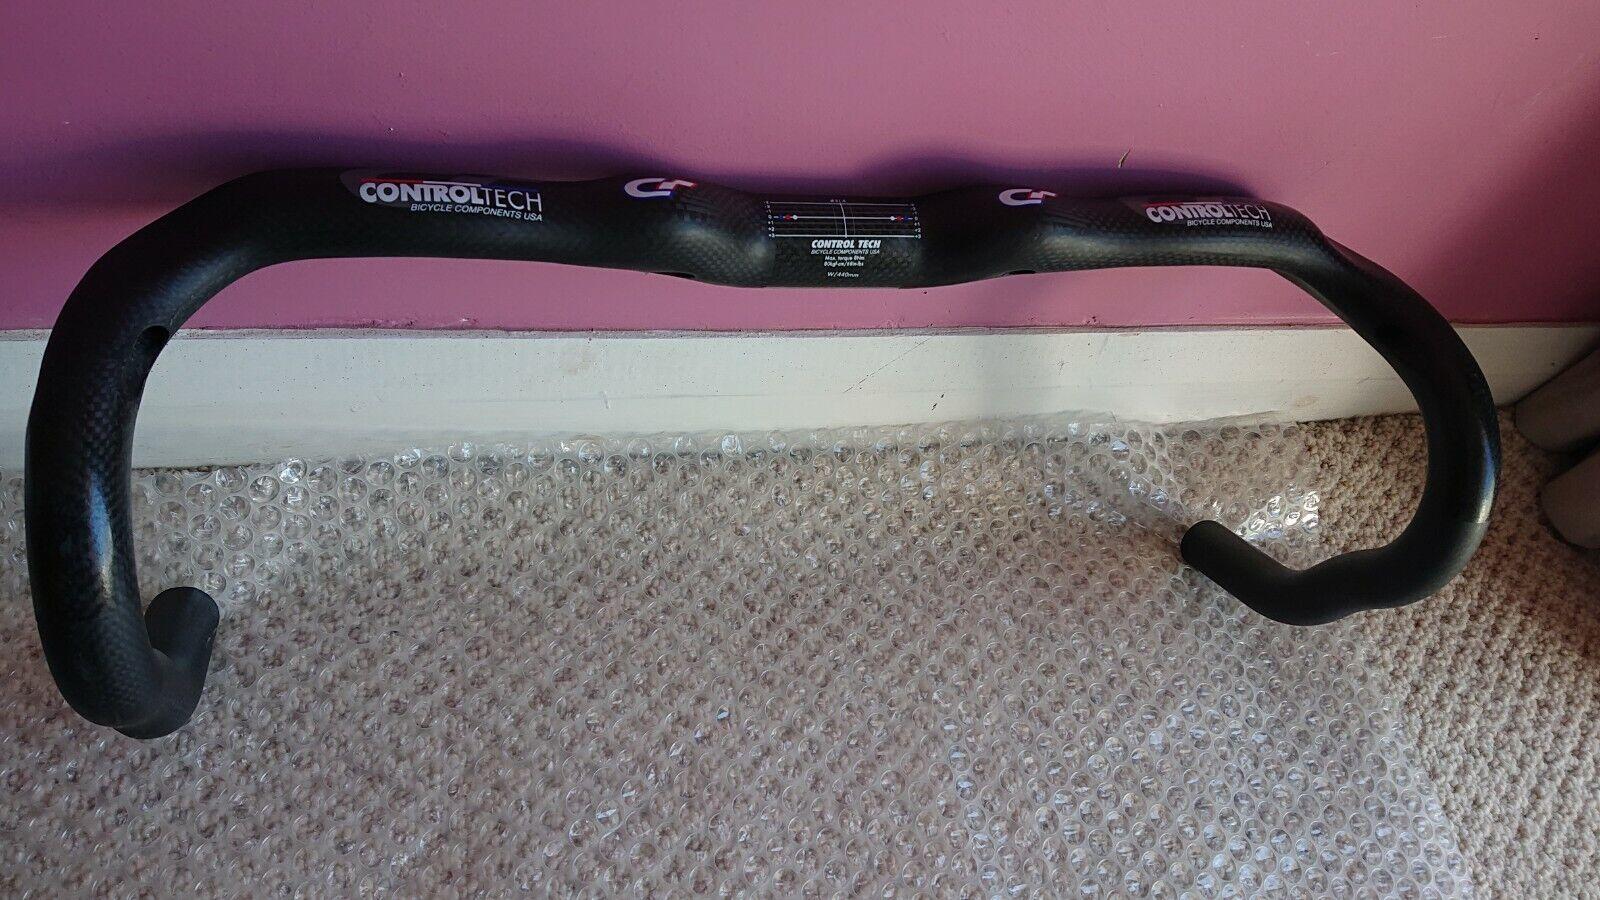 Steuerung   Control Tech Carbon Comp Handles - 44cm - Brand New.